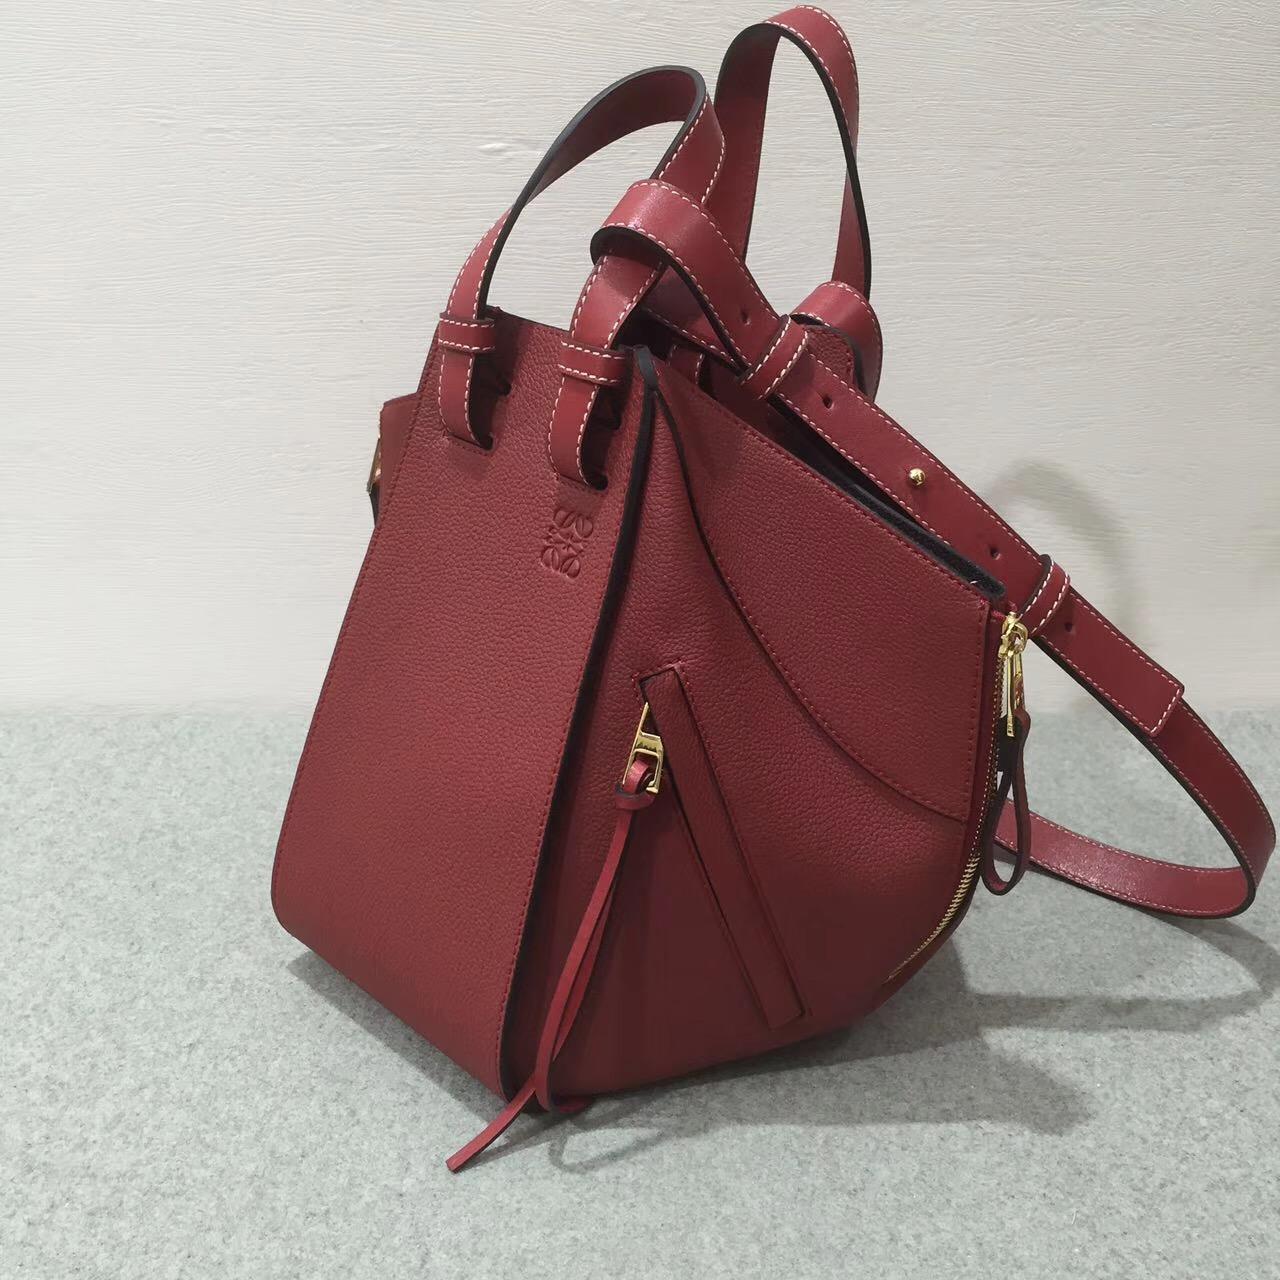 Loewe羅意威 Hammock Small Bag 顆粒小牛皮胭脂红 吊床包